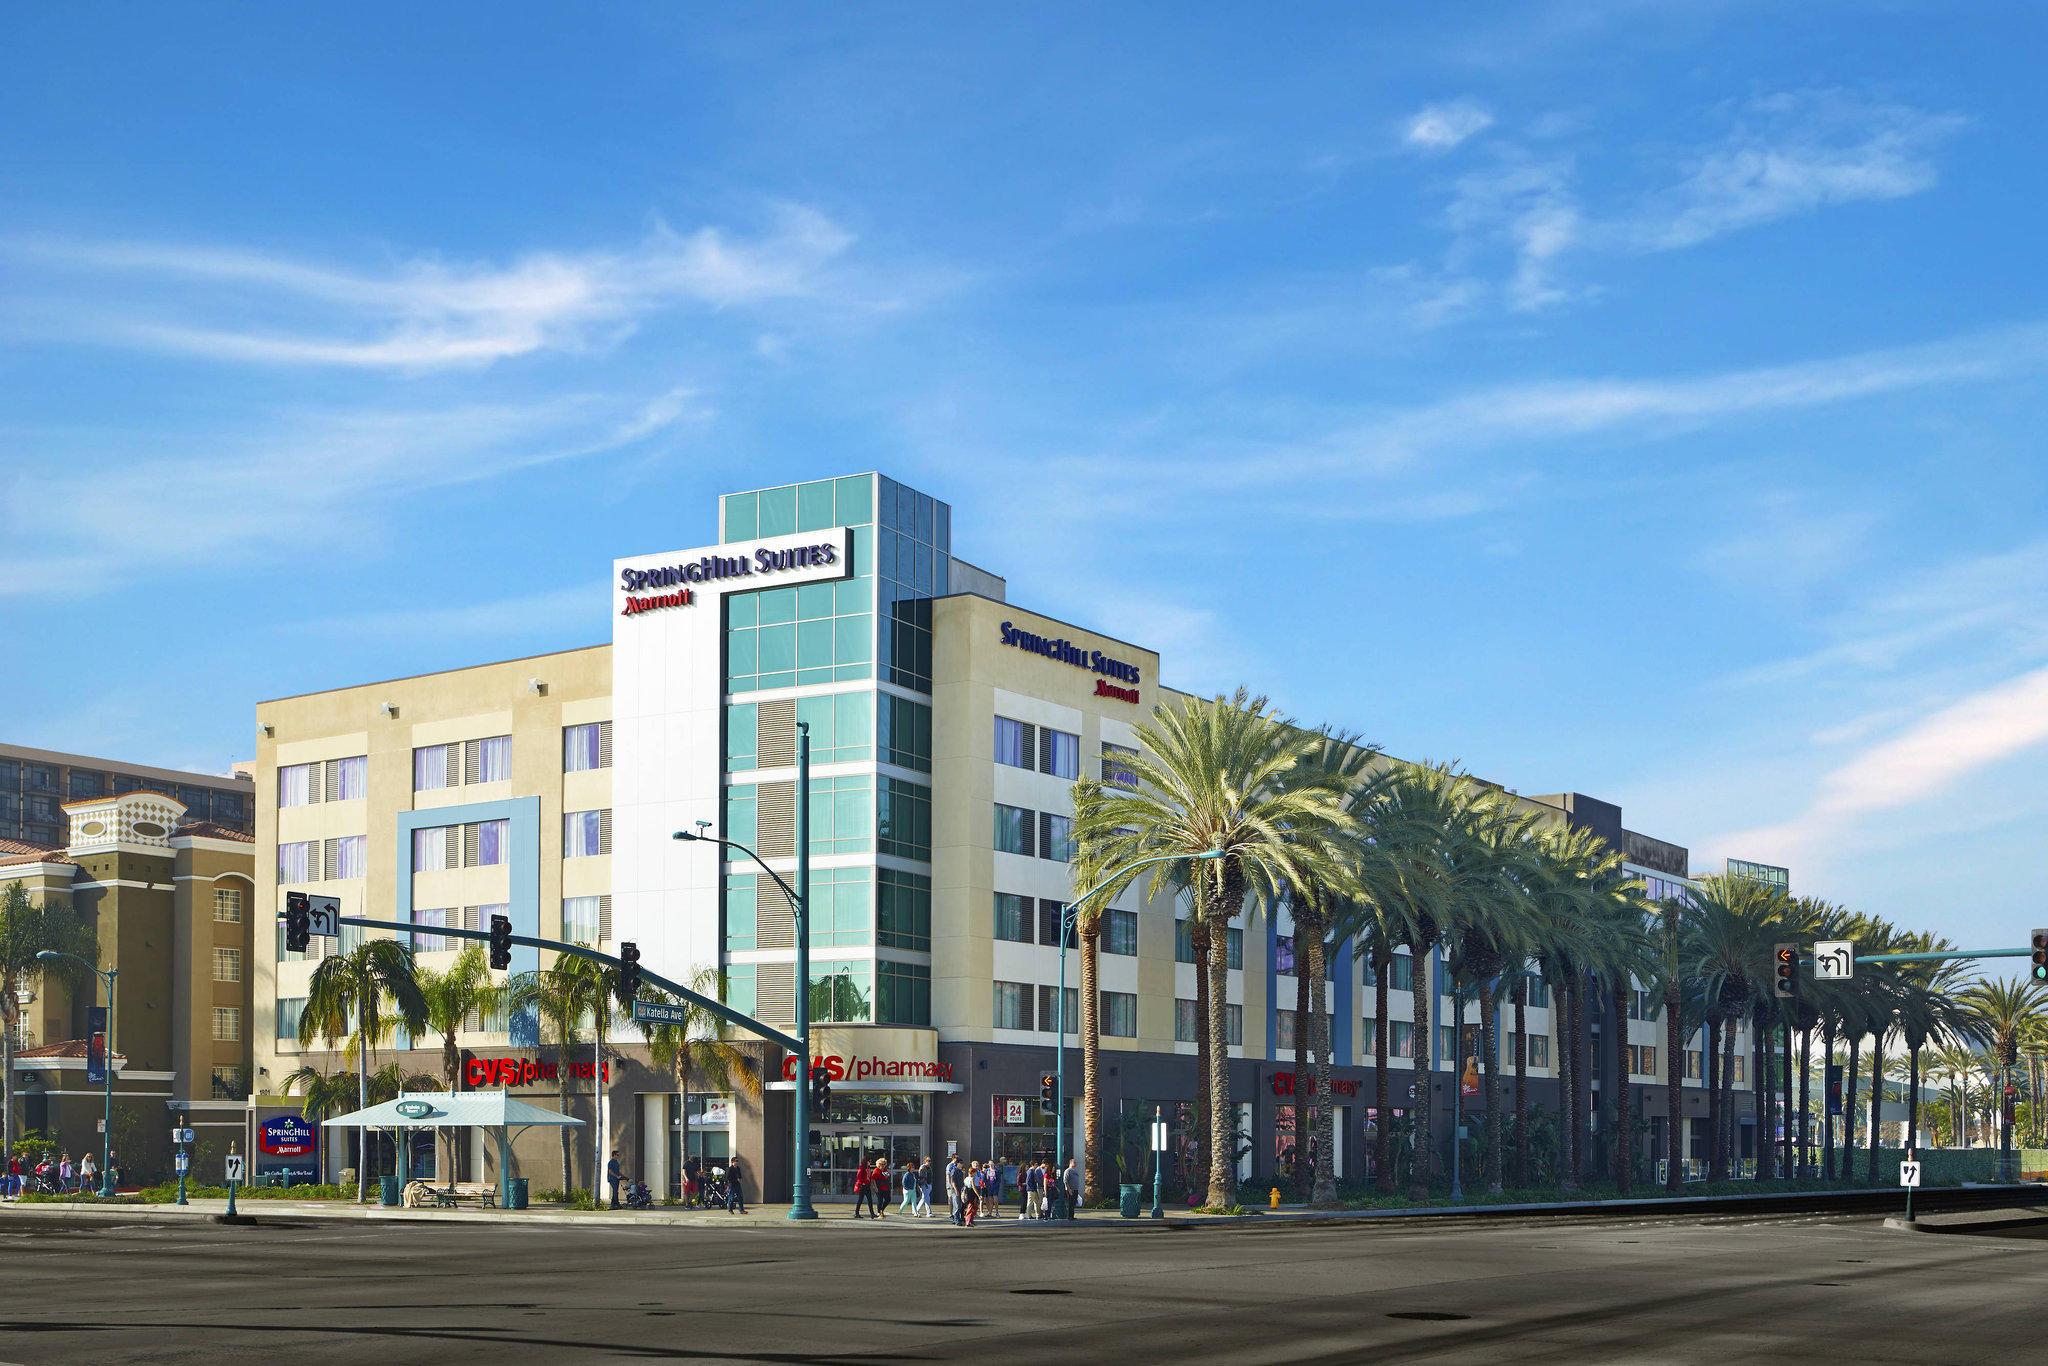 SpringHill Suites by Marriott at Anaheim Resort/Convention Center